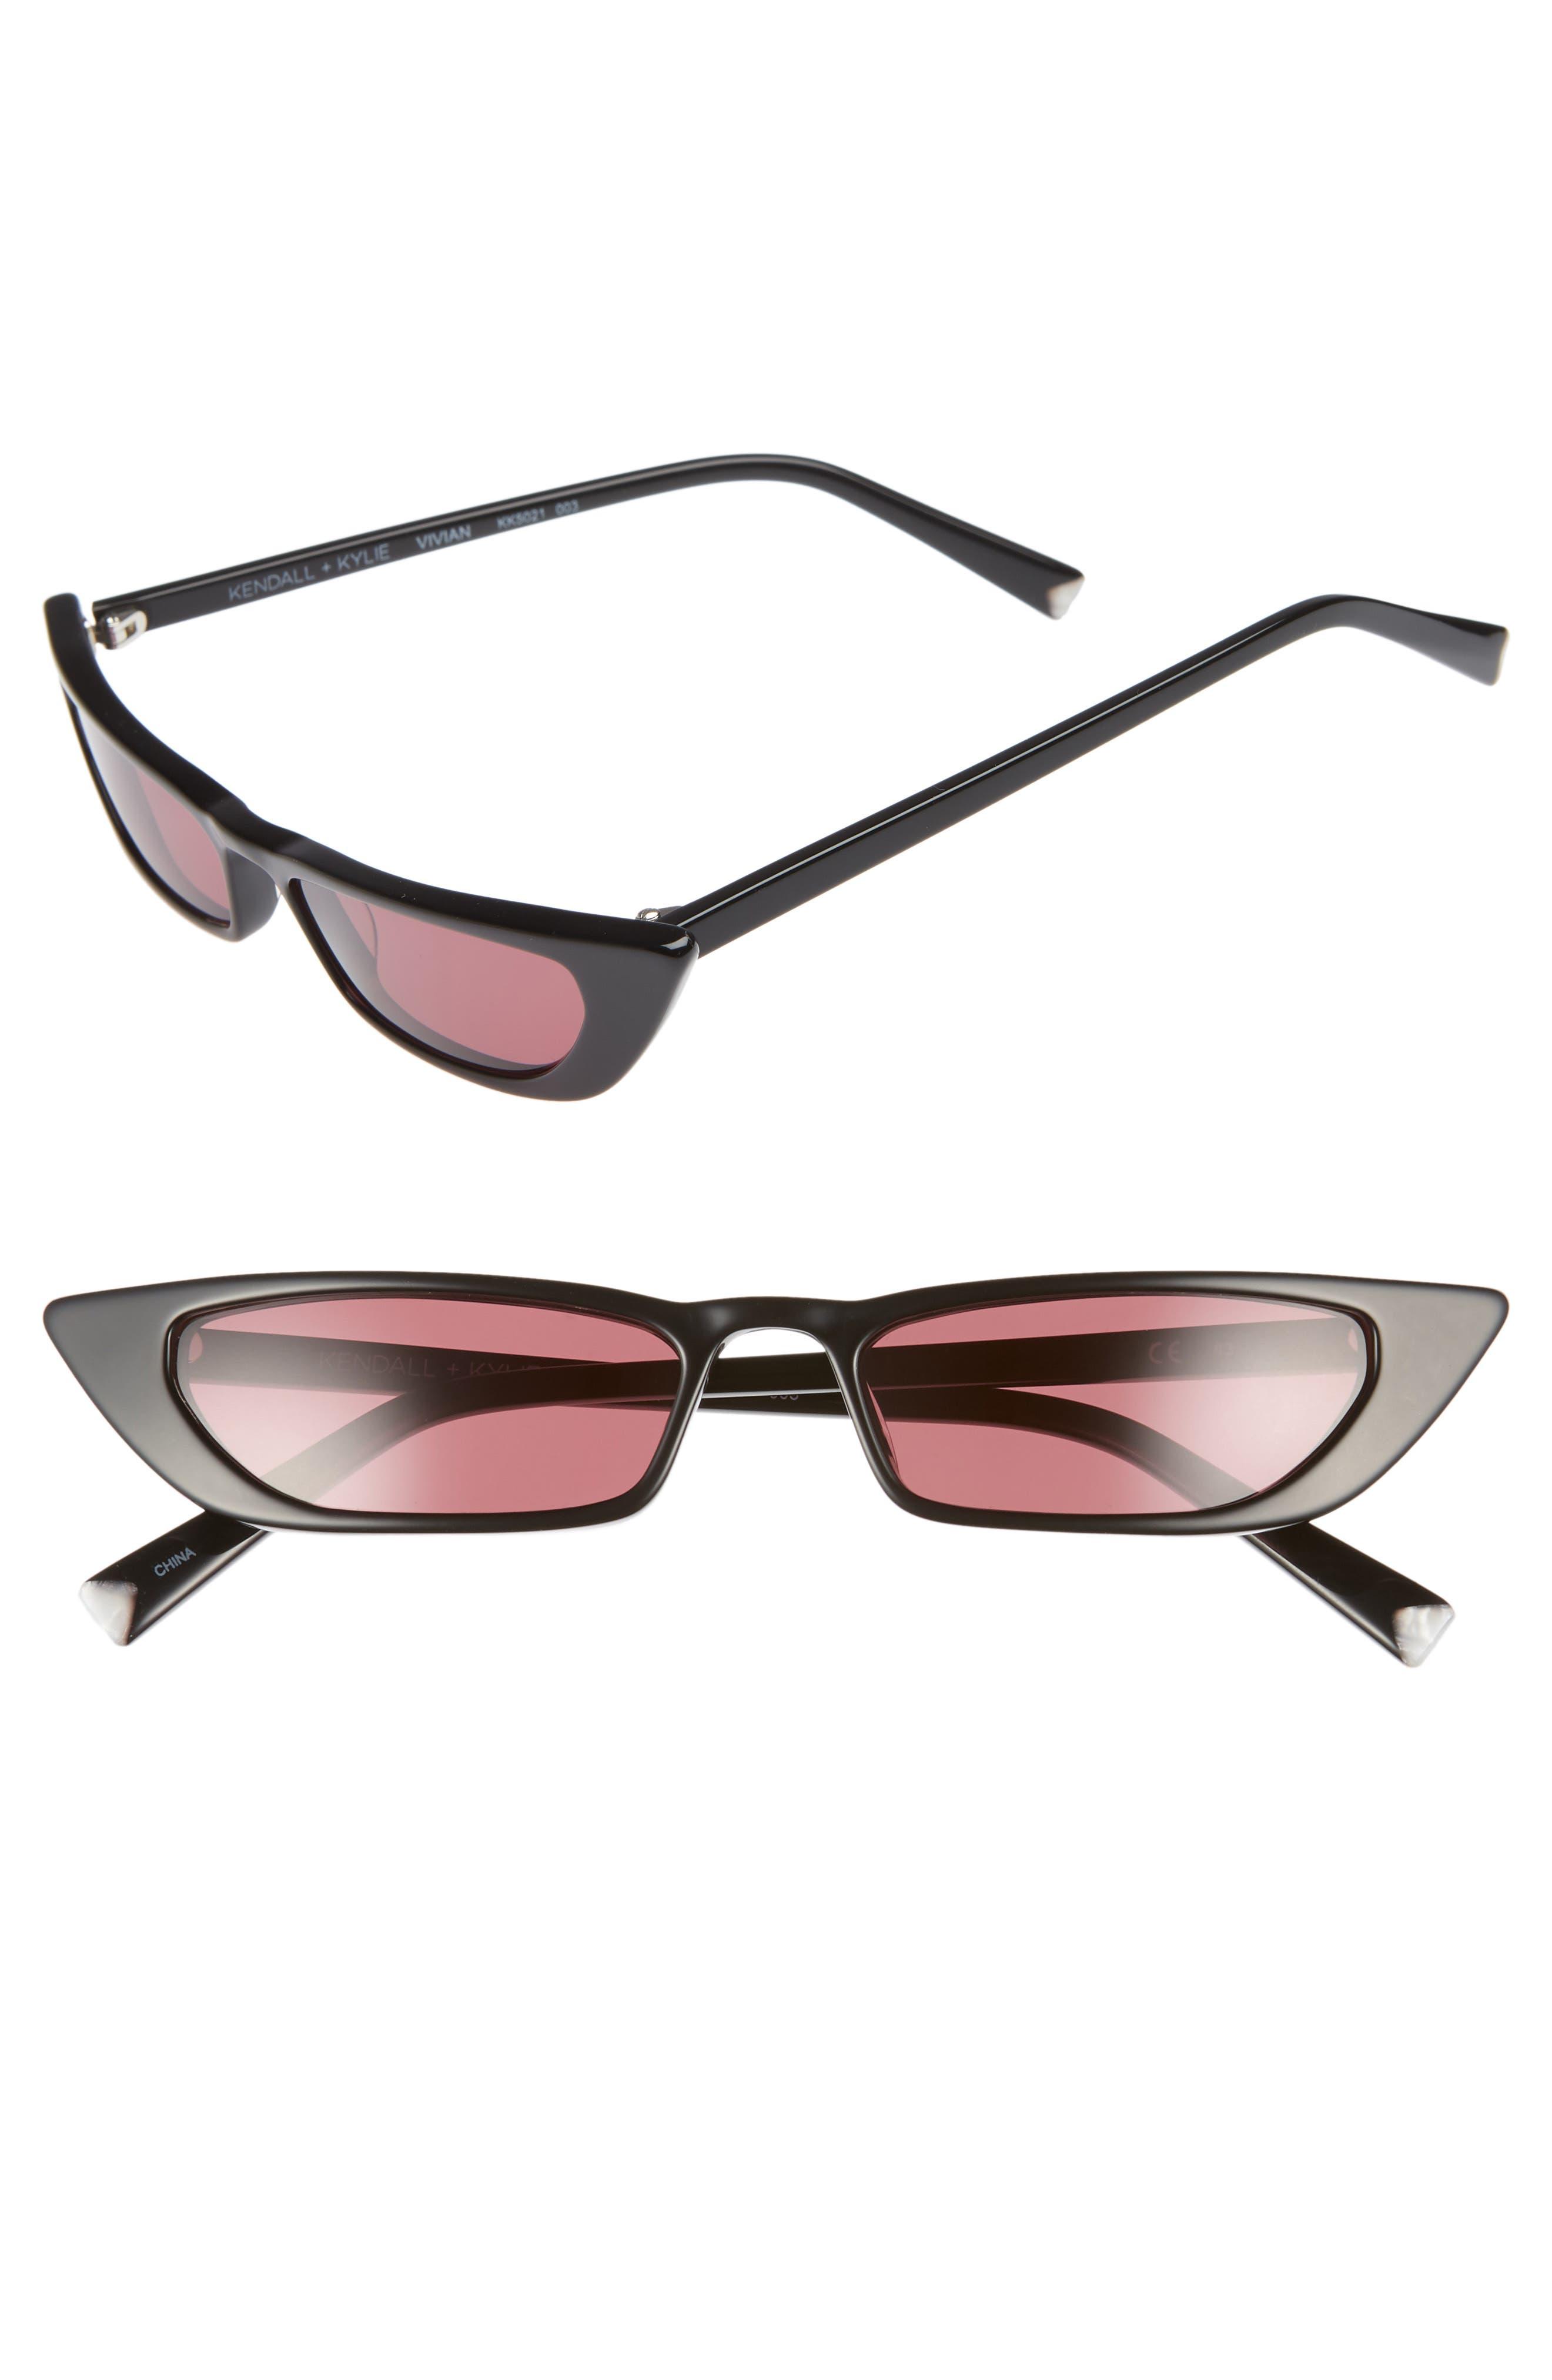 Kendall + Kylie Vivian 51Mm Extreme Cat Eye Sunglasses - Black